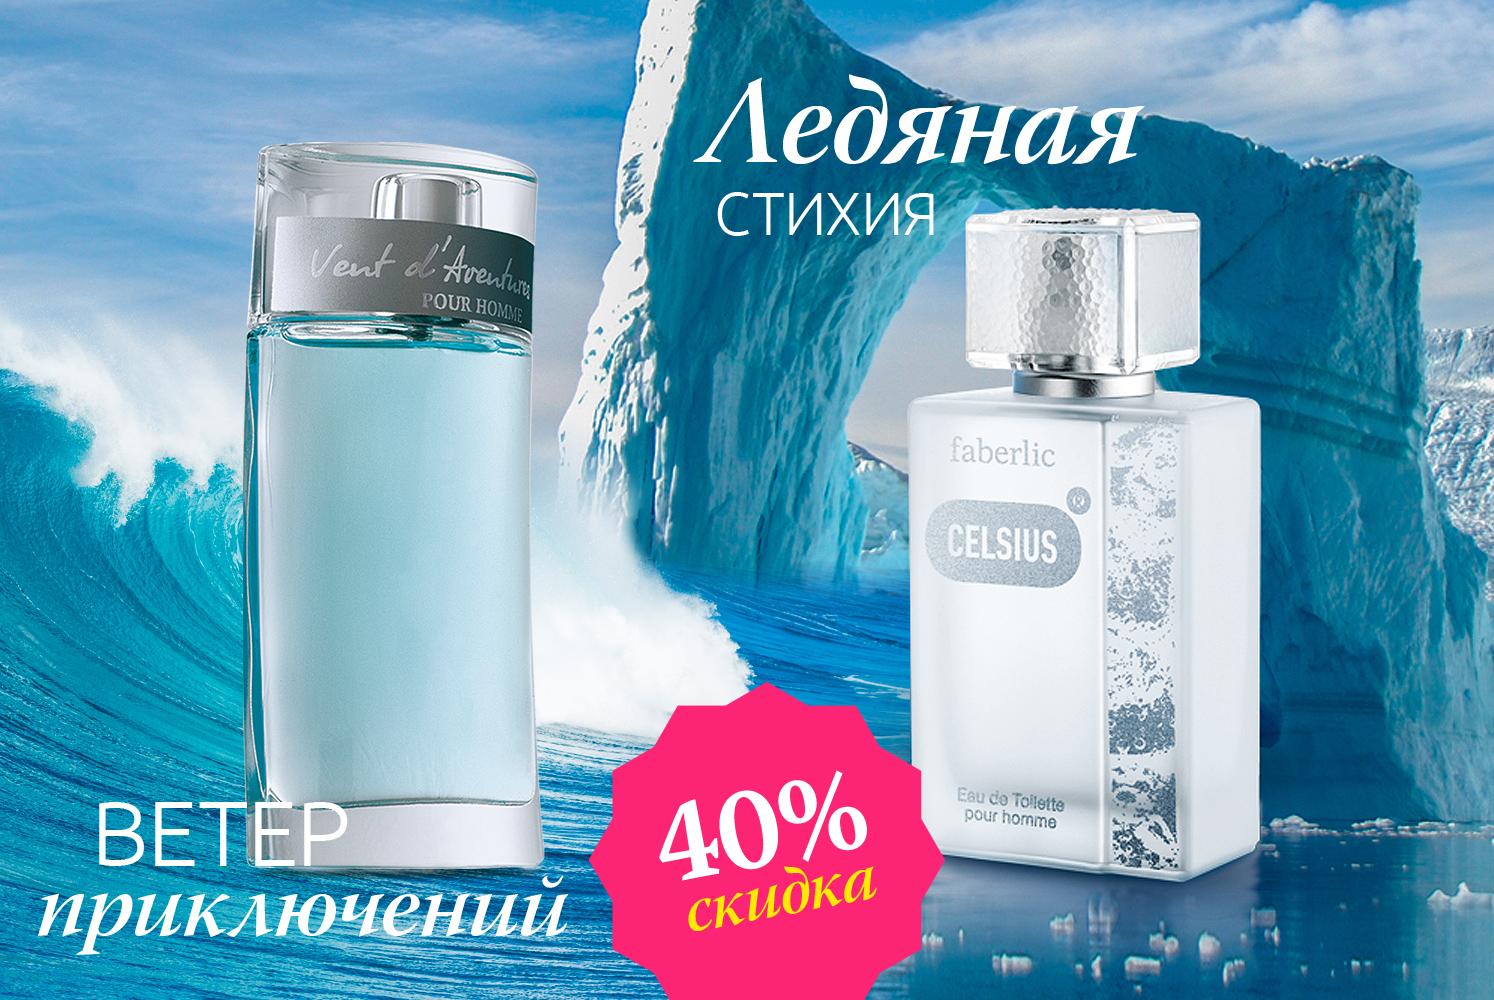 10-parfum-3-2016-action